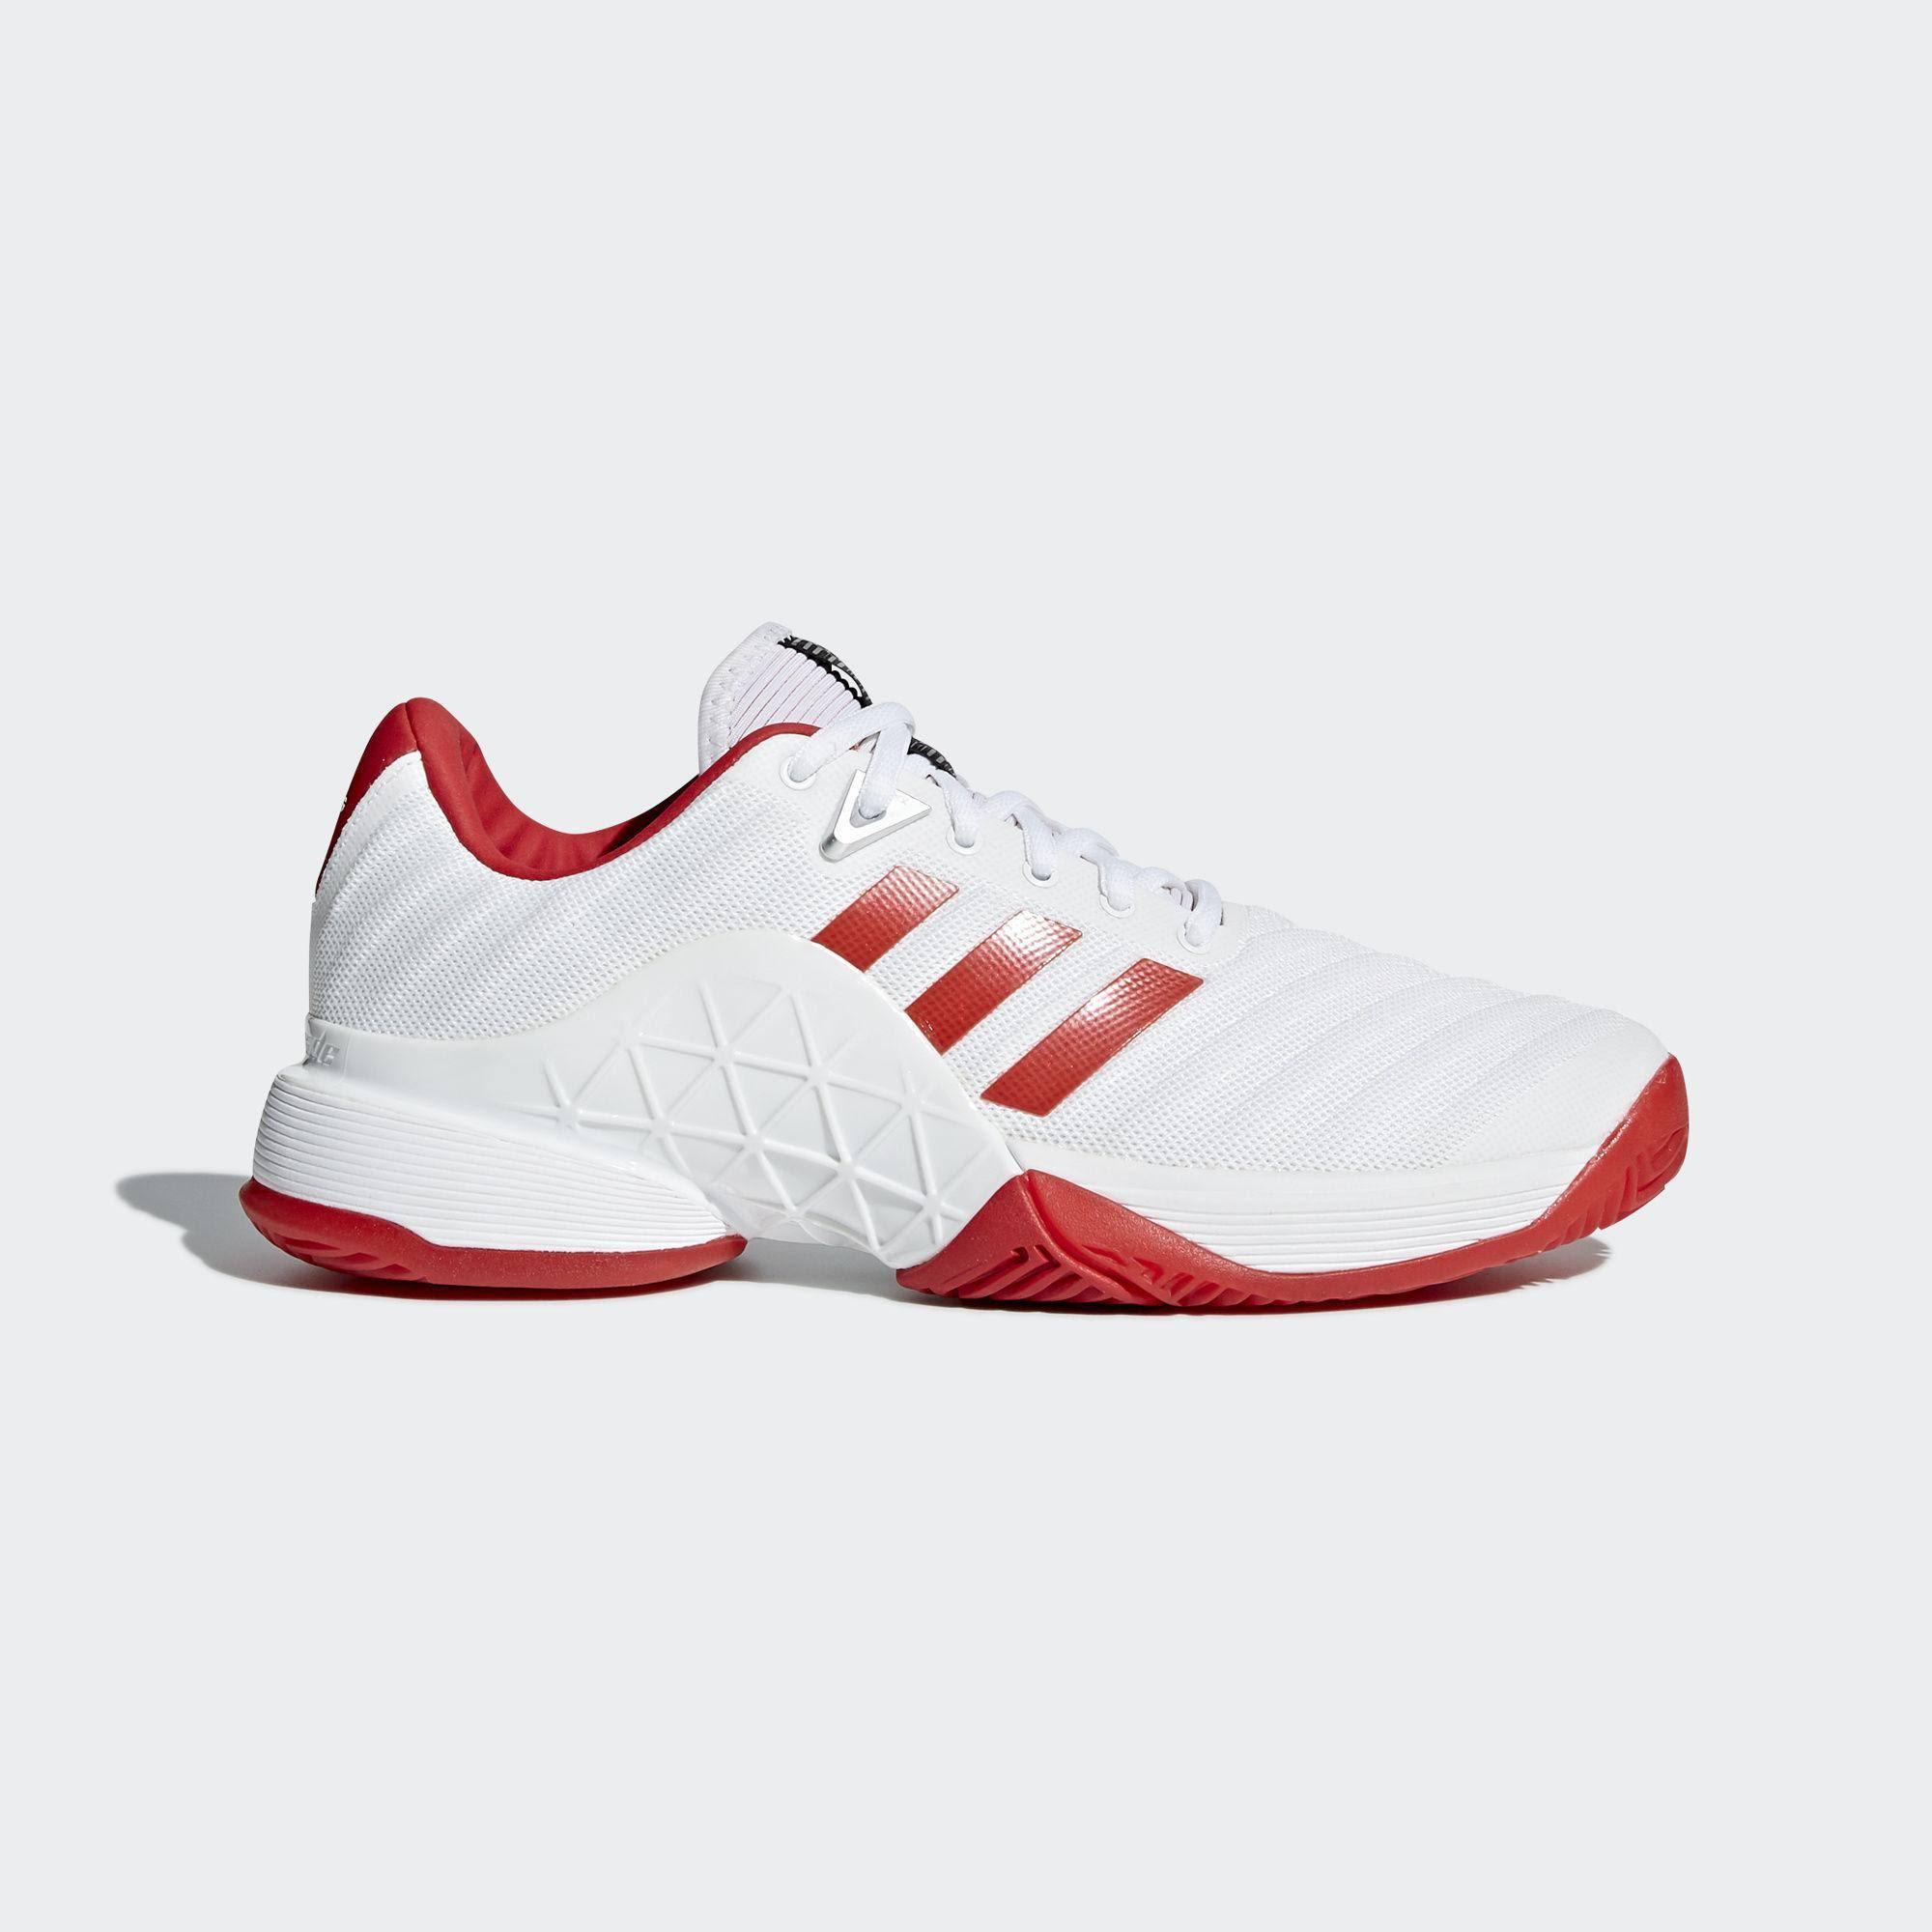 Adidas Womens Barricade 2018 Tennis Shoes - White UK 7